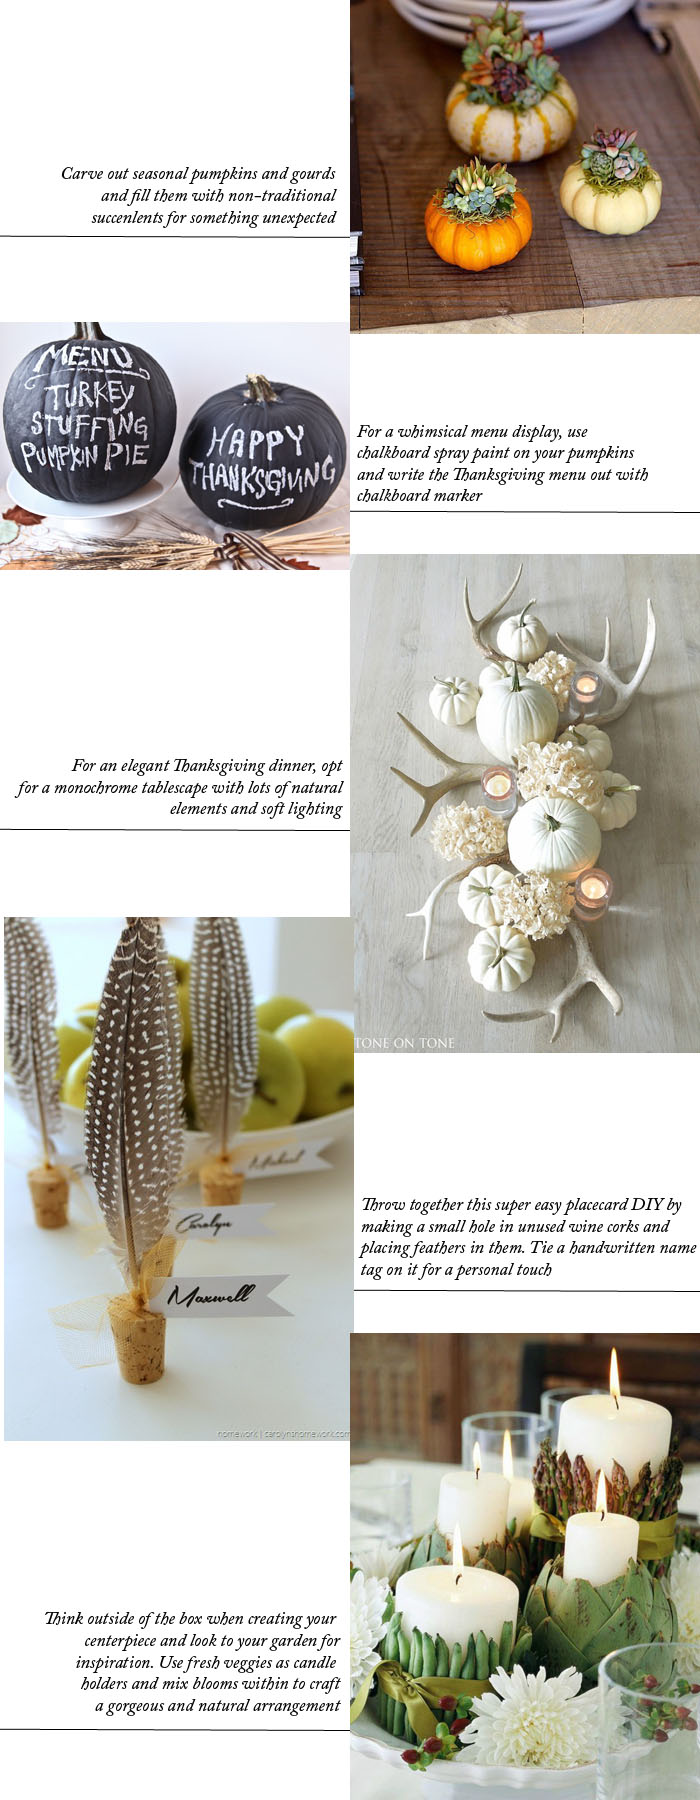 Thanksgiving ideas, centerpiece, tablescape